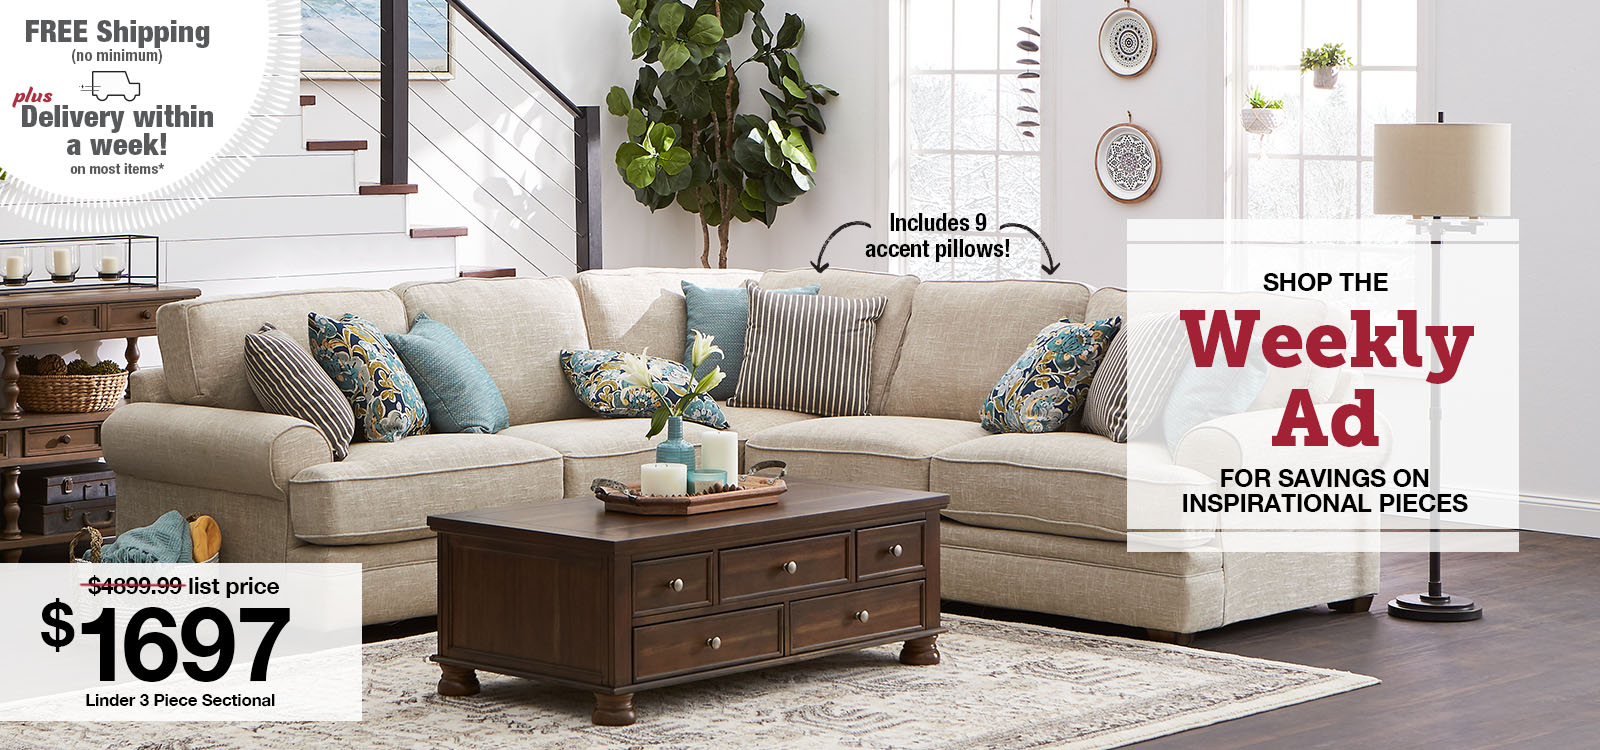 Slumberland Furniture | Slumberland Furniture on